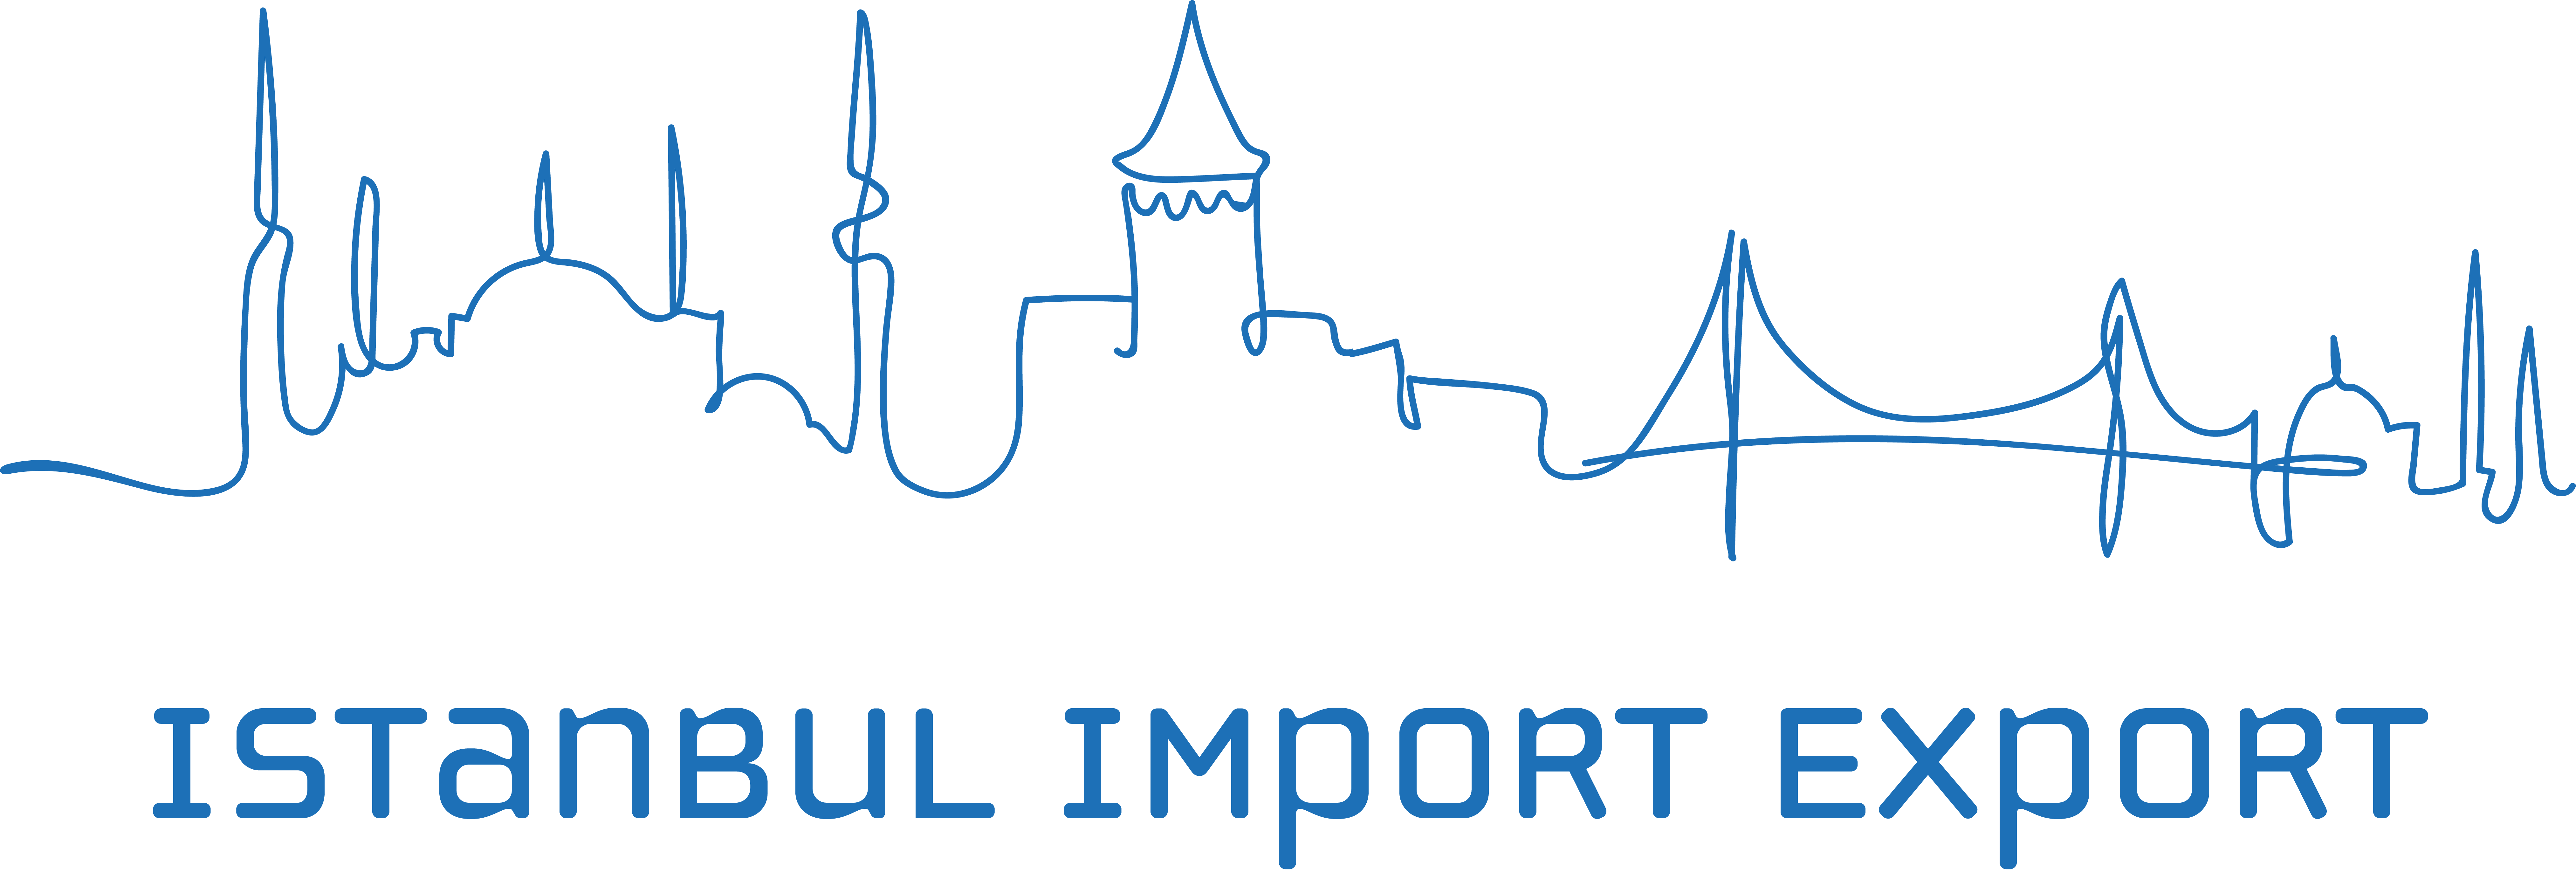 ISTANBUL IMPORT EXPORT